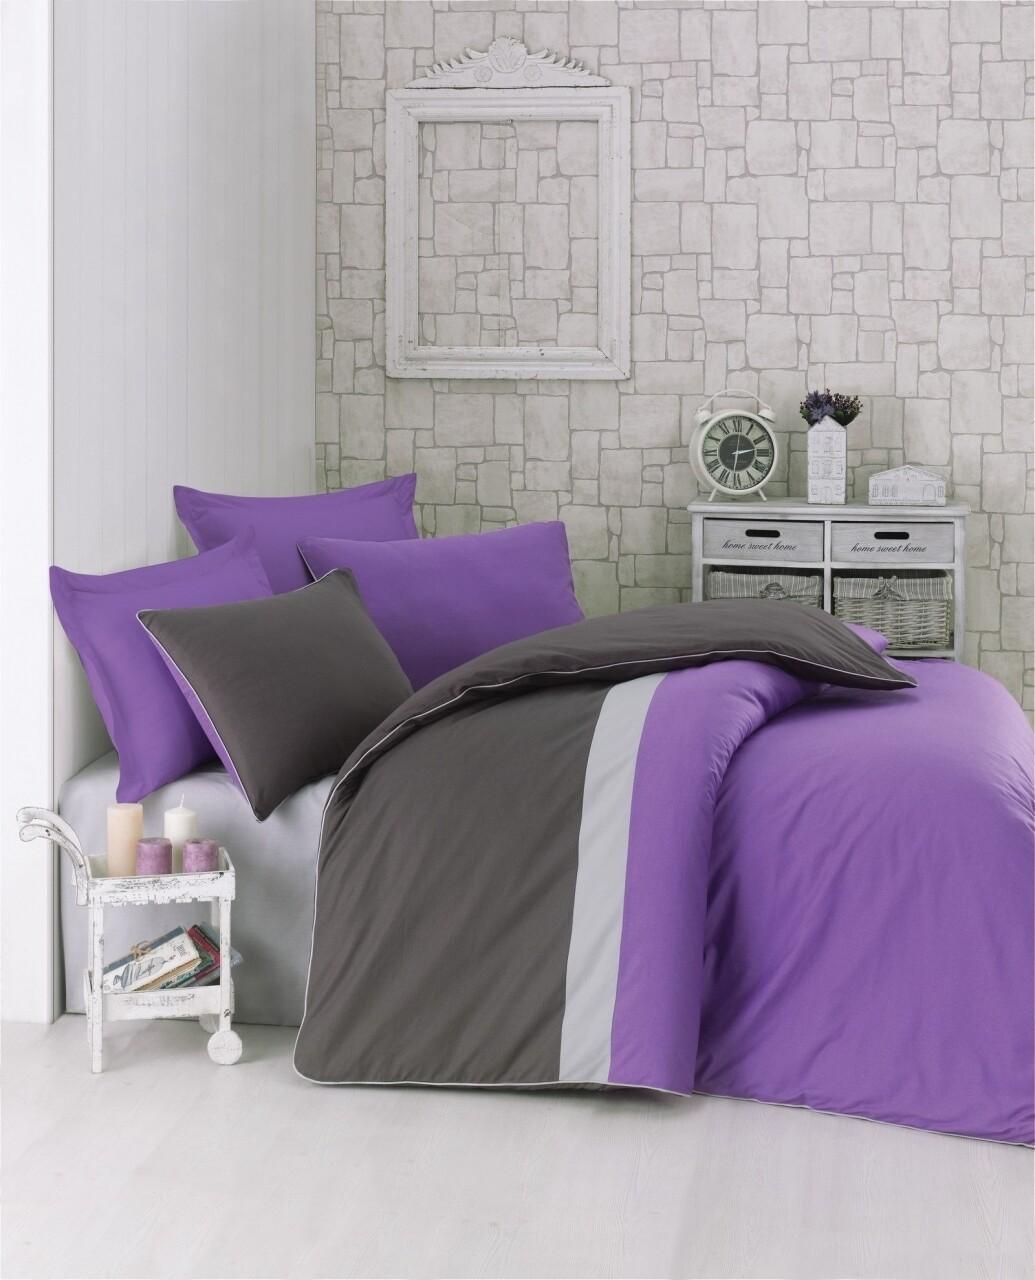 Lenjerie de pat pentru o persoana, 3 piese, 100% bumbac ranforce, Cotton Box, Plain Sport Purple